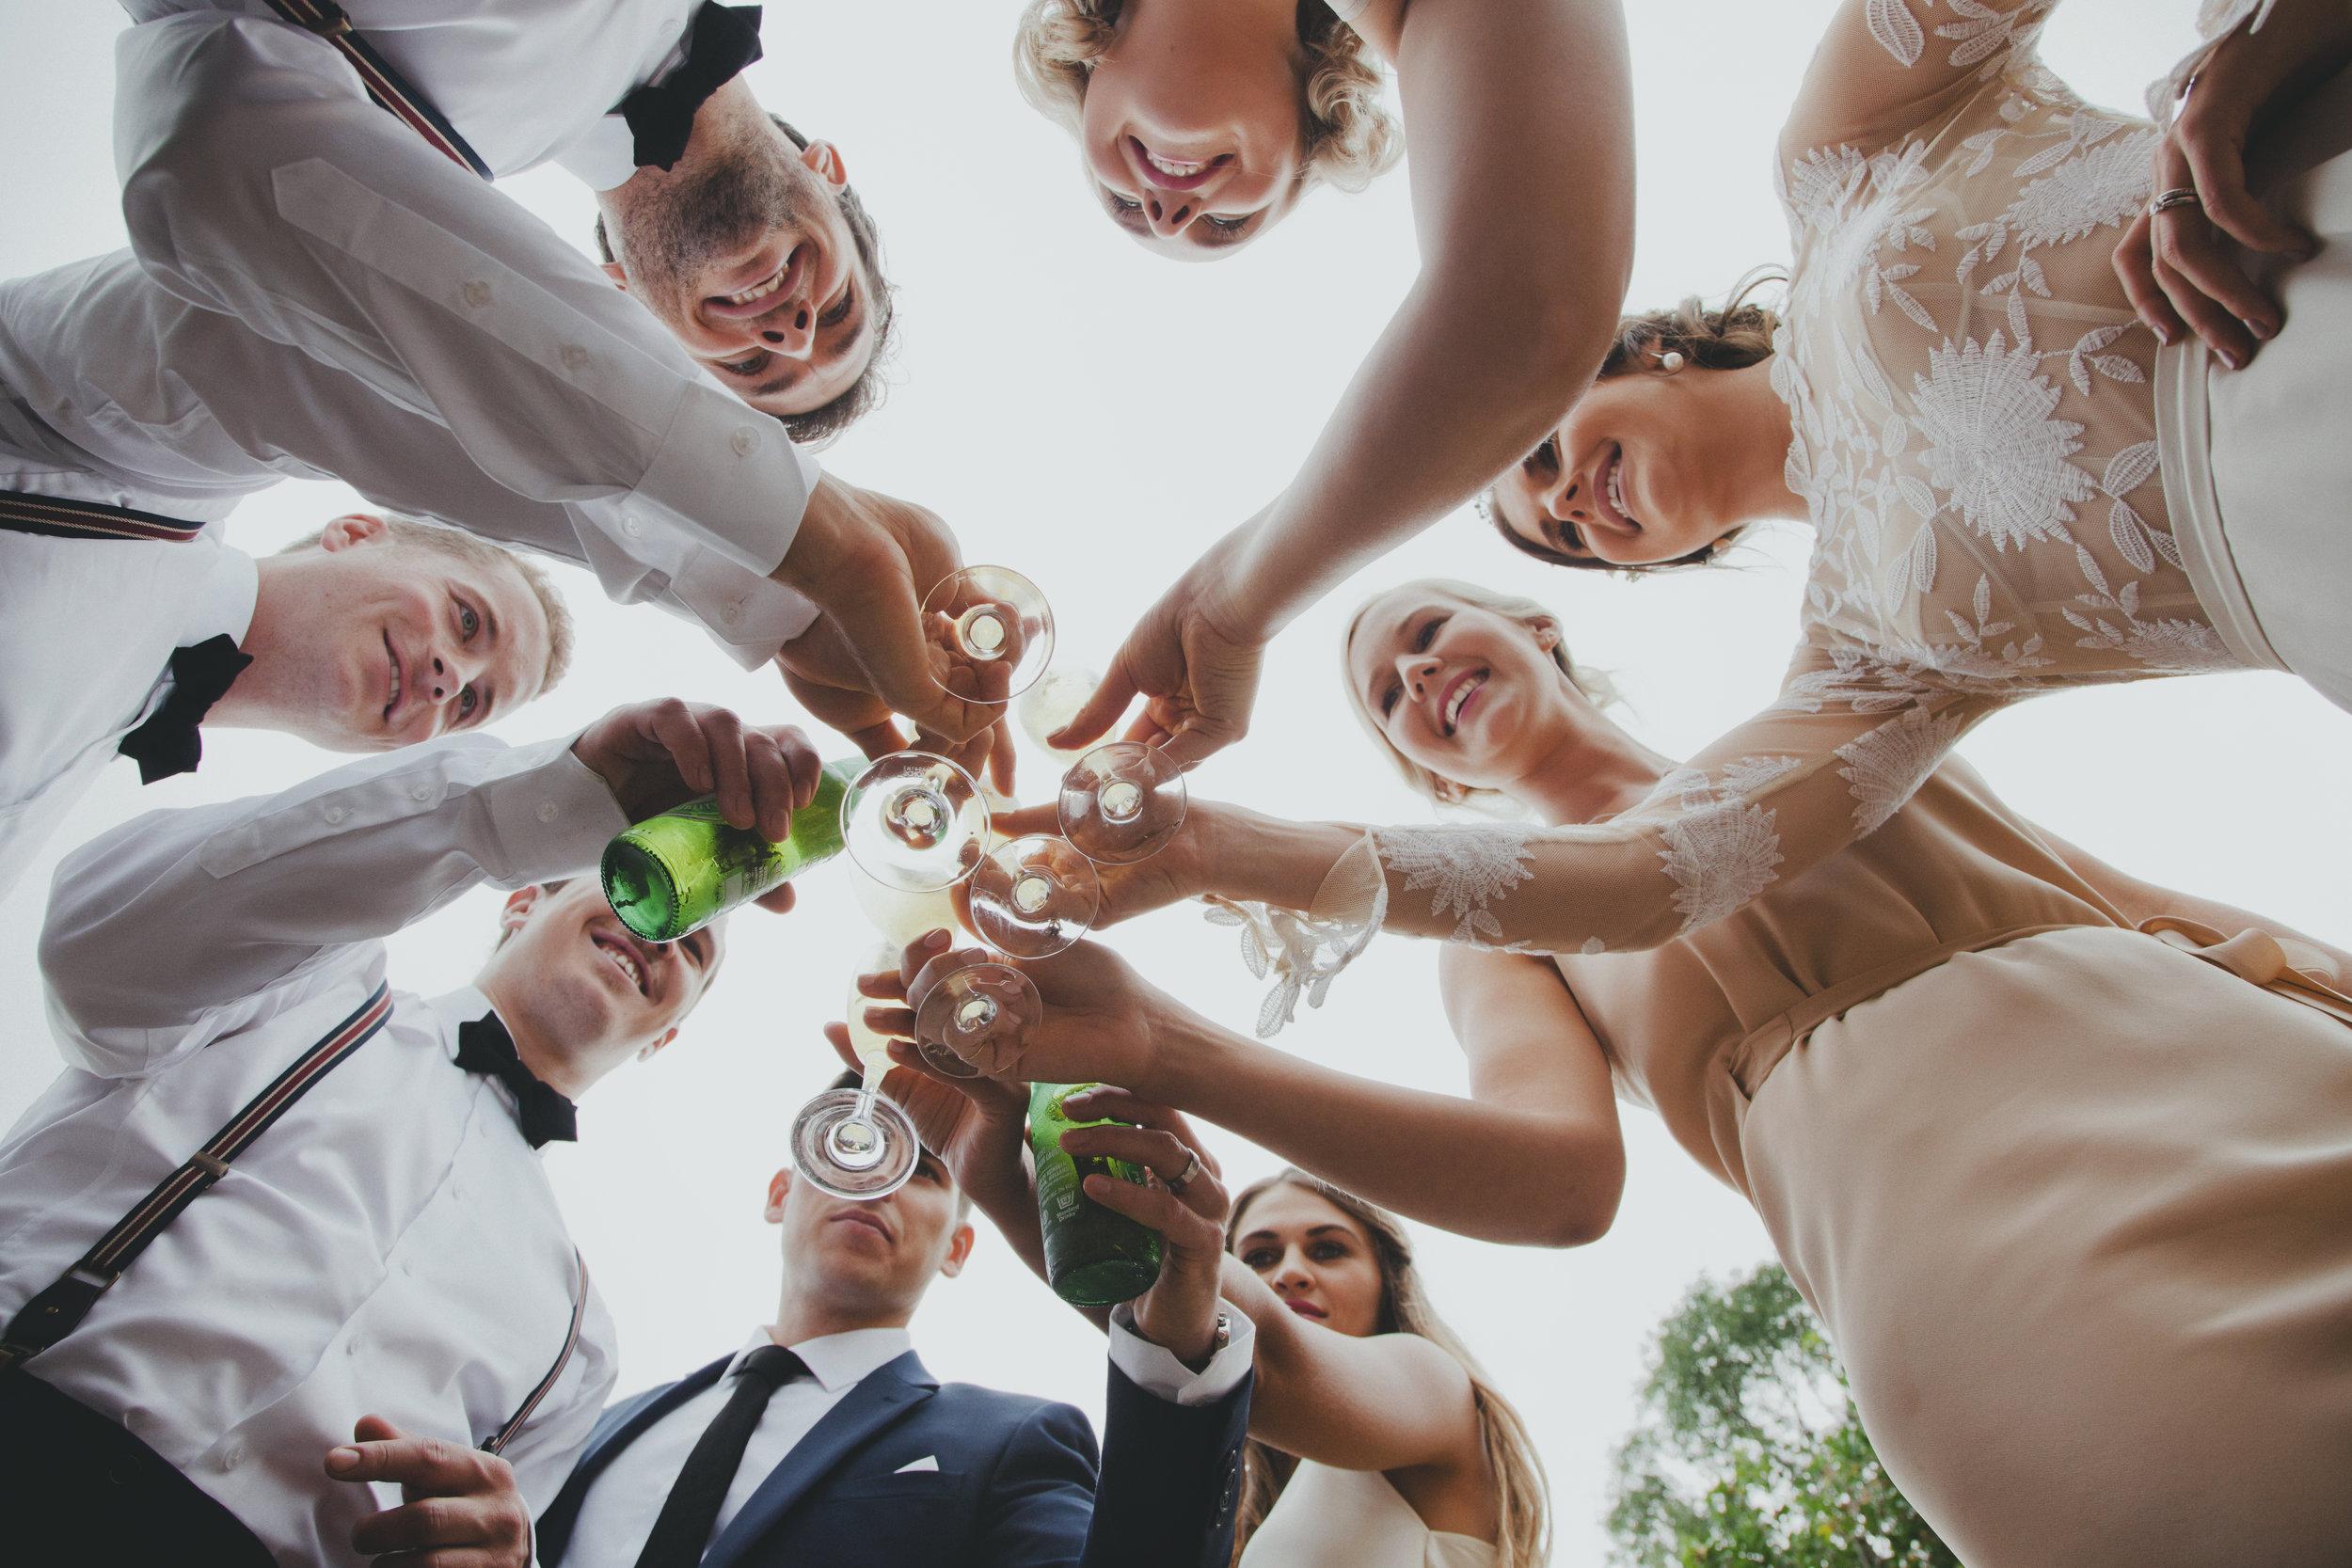 wellington wedding photography NZ - 1064.JPG